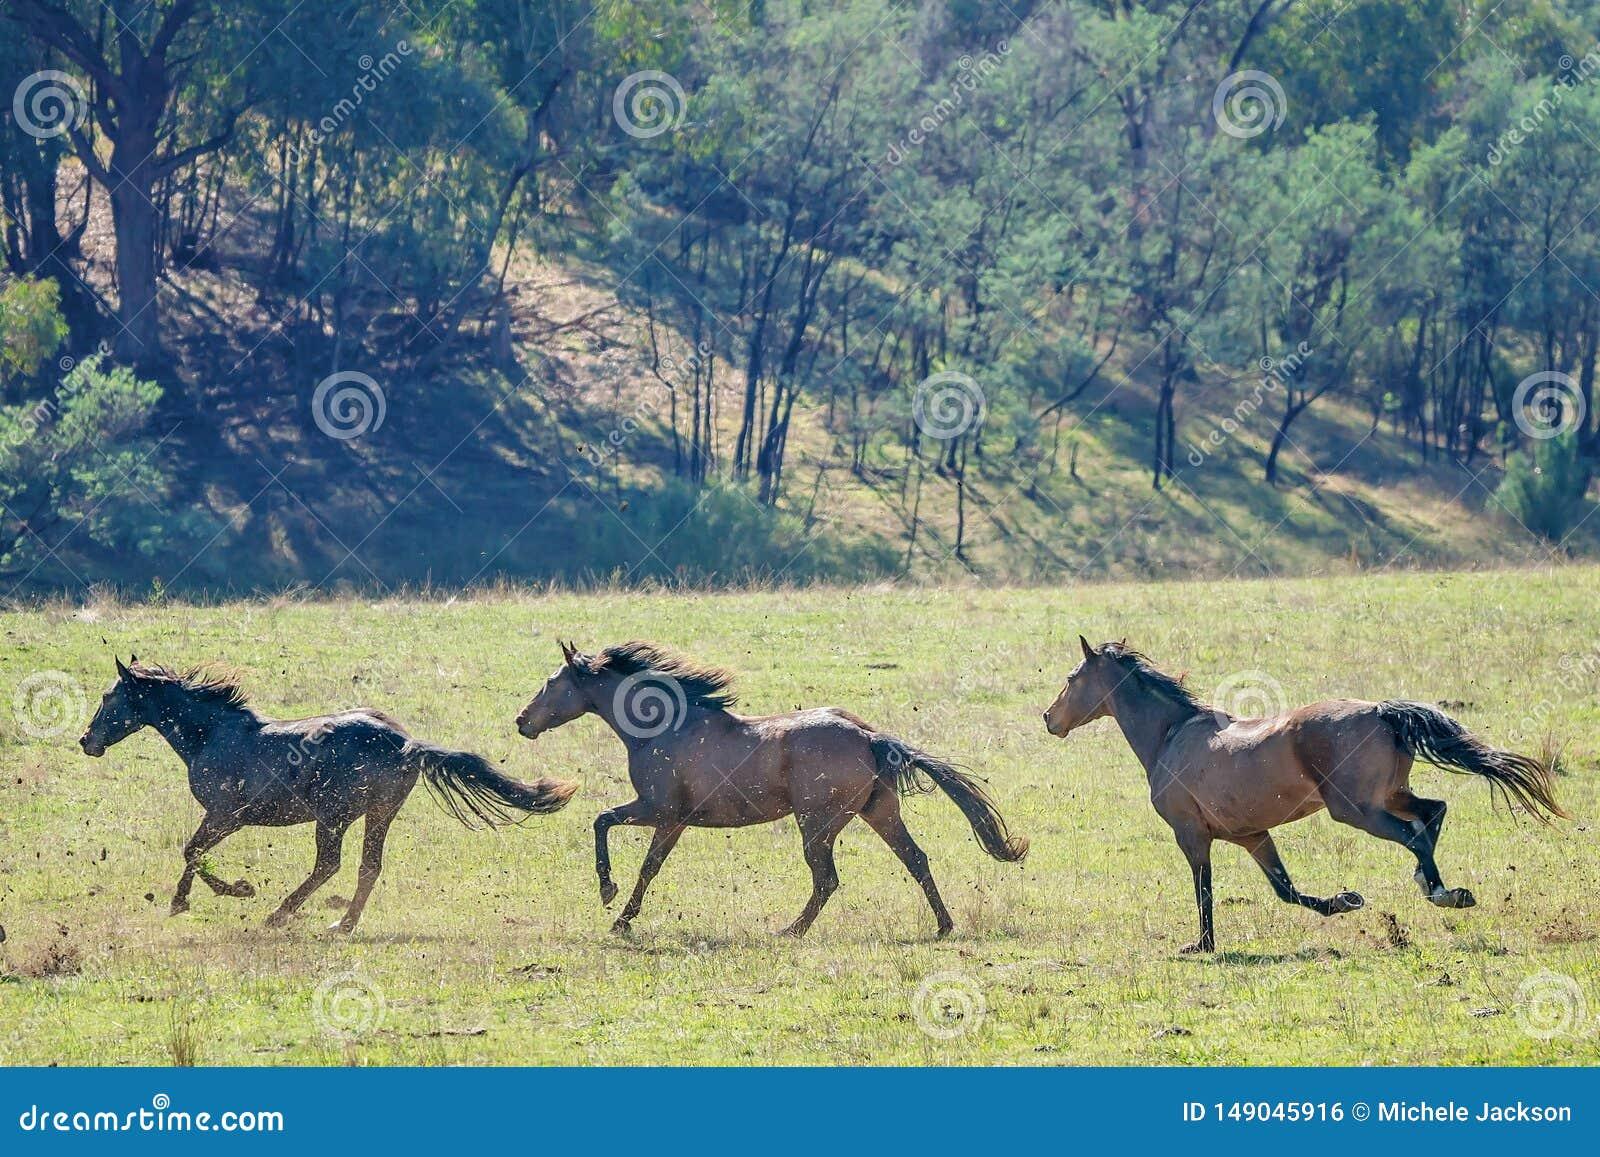 Three Galloping Wild Horses Stock Photo Image Of Horse Galloping 149045916